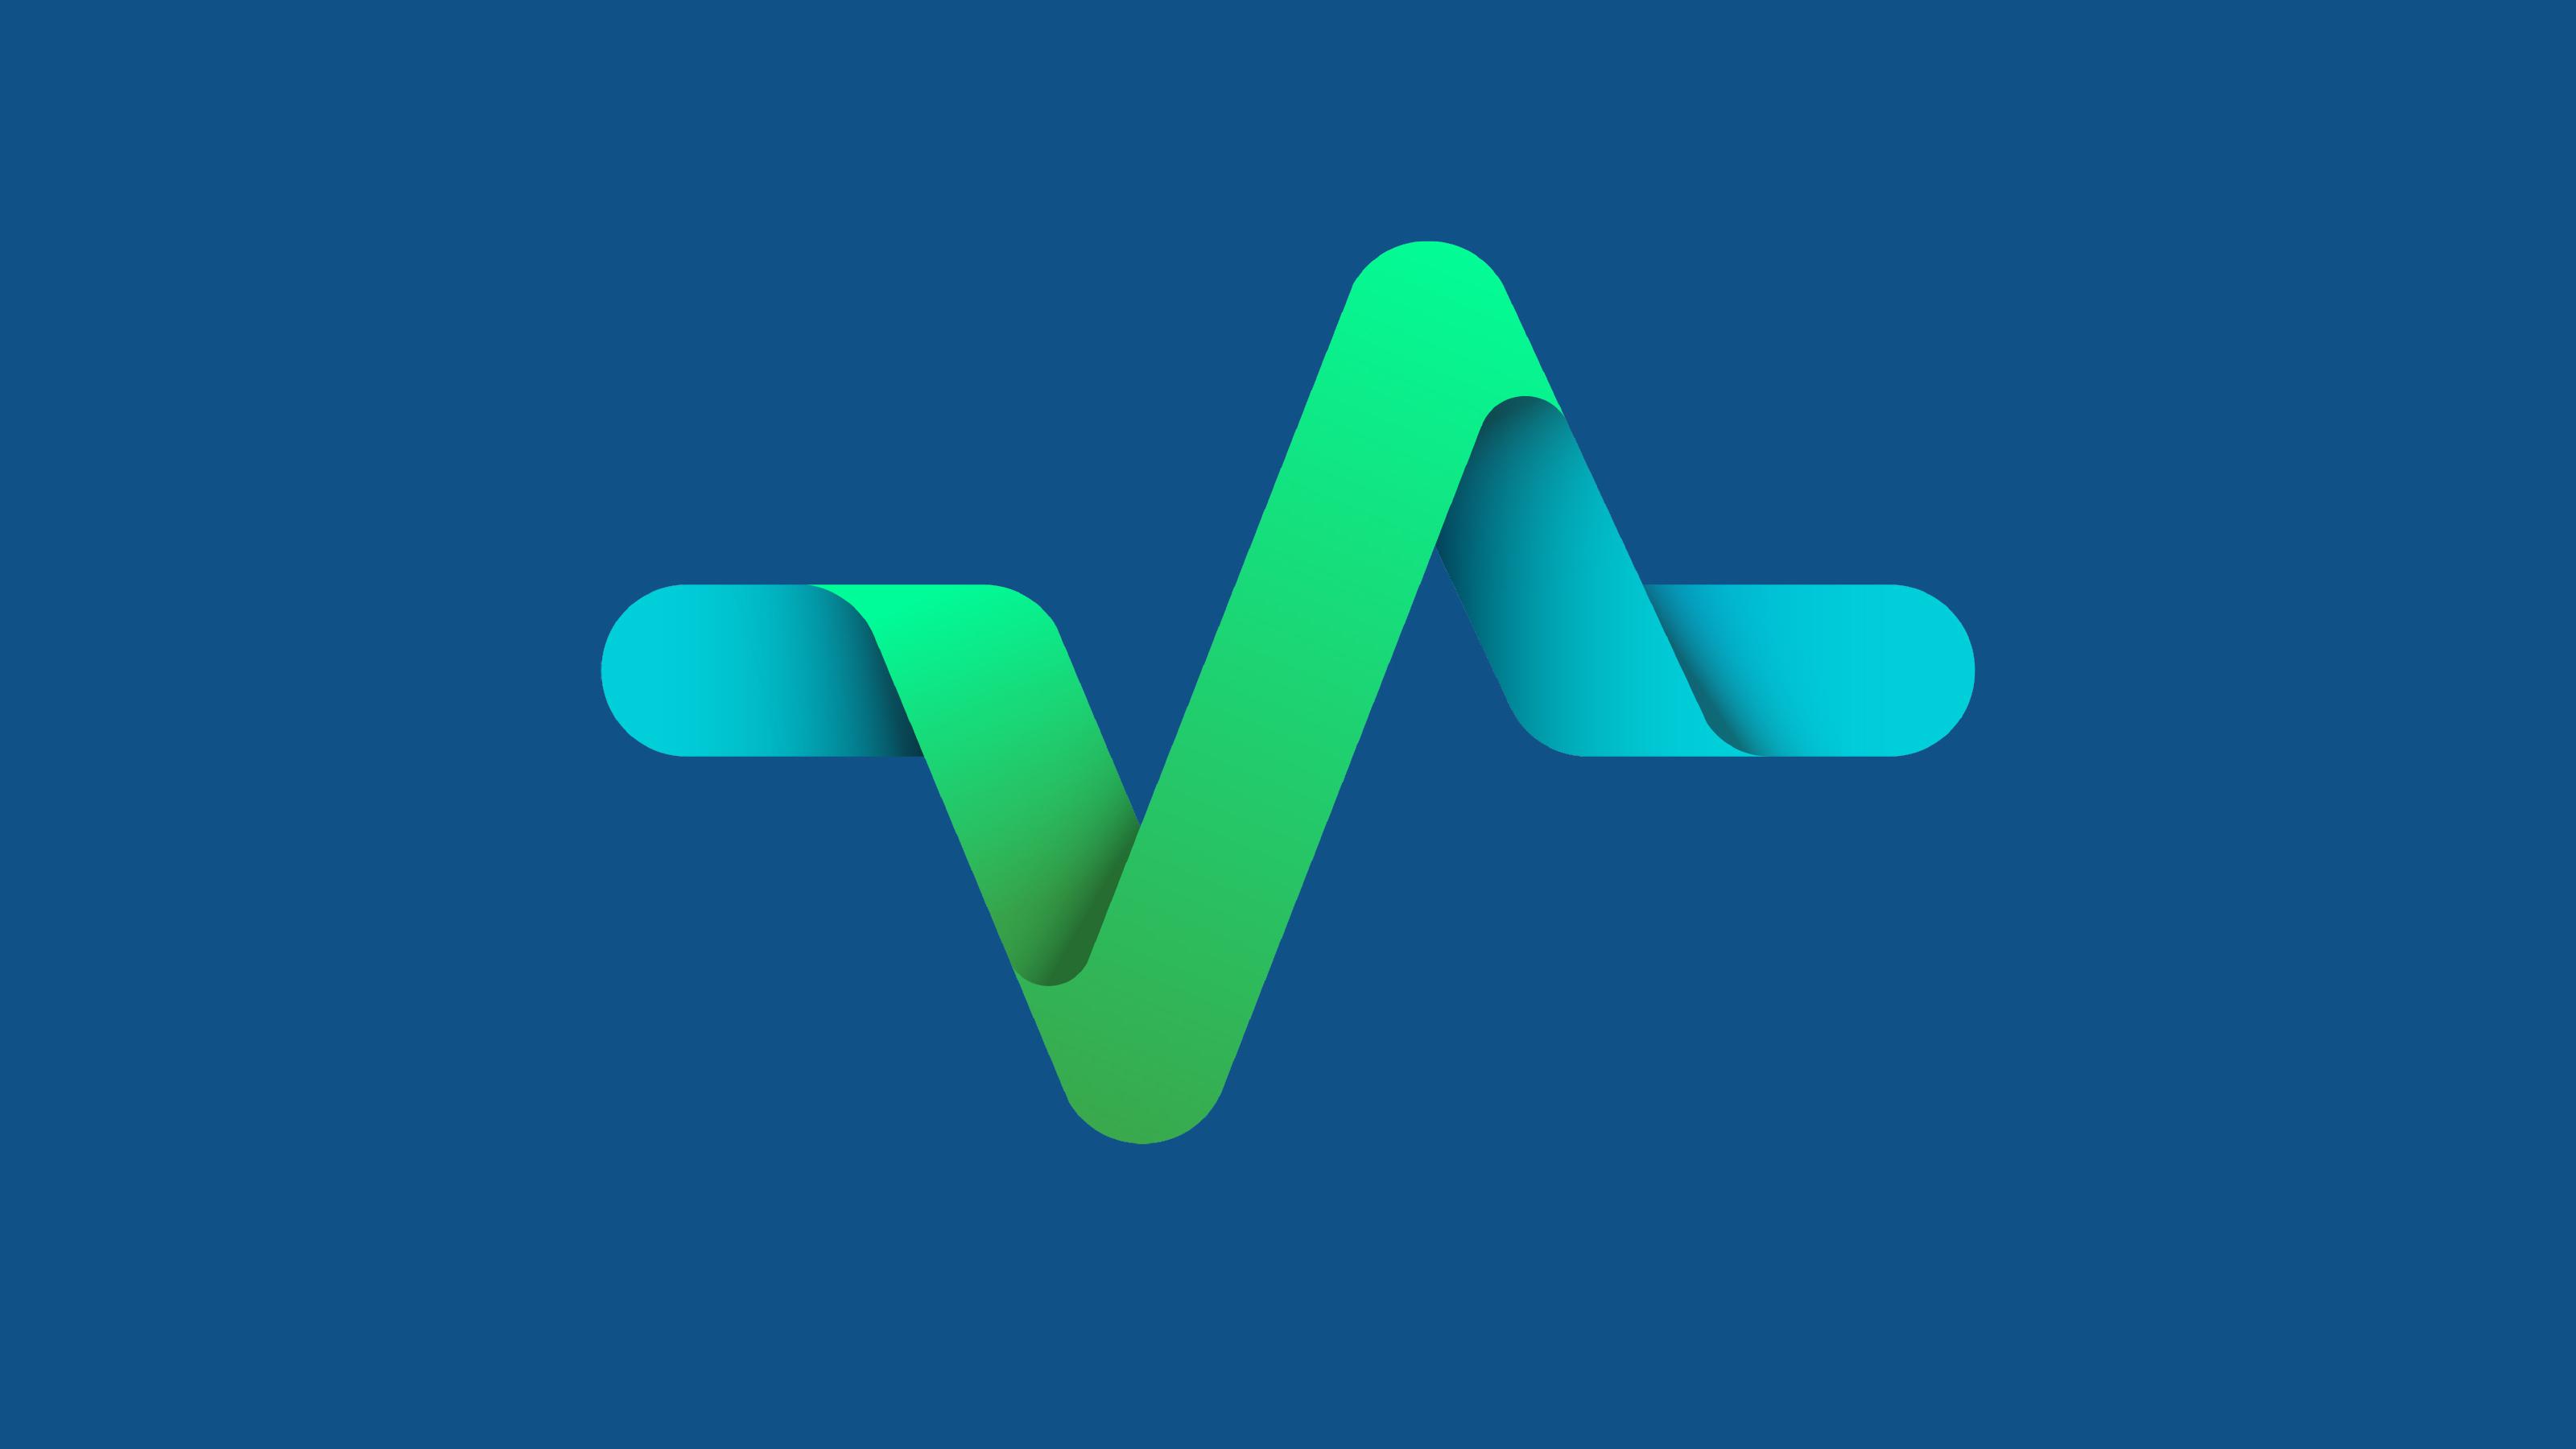 Brand_logo_design_Verv